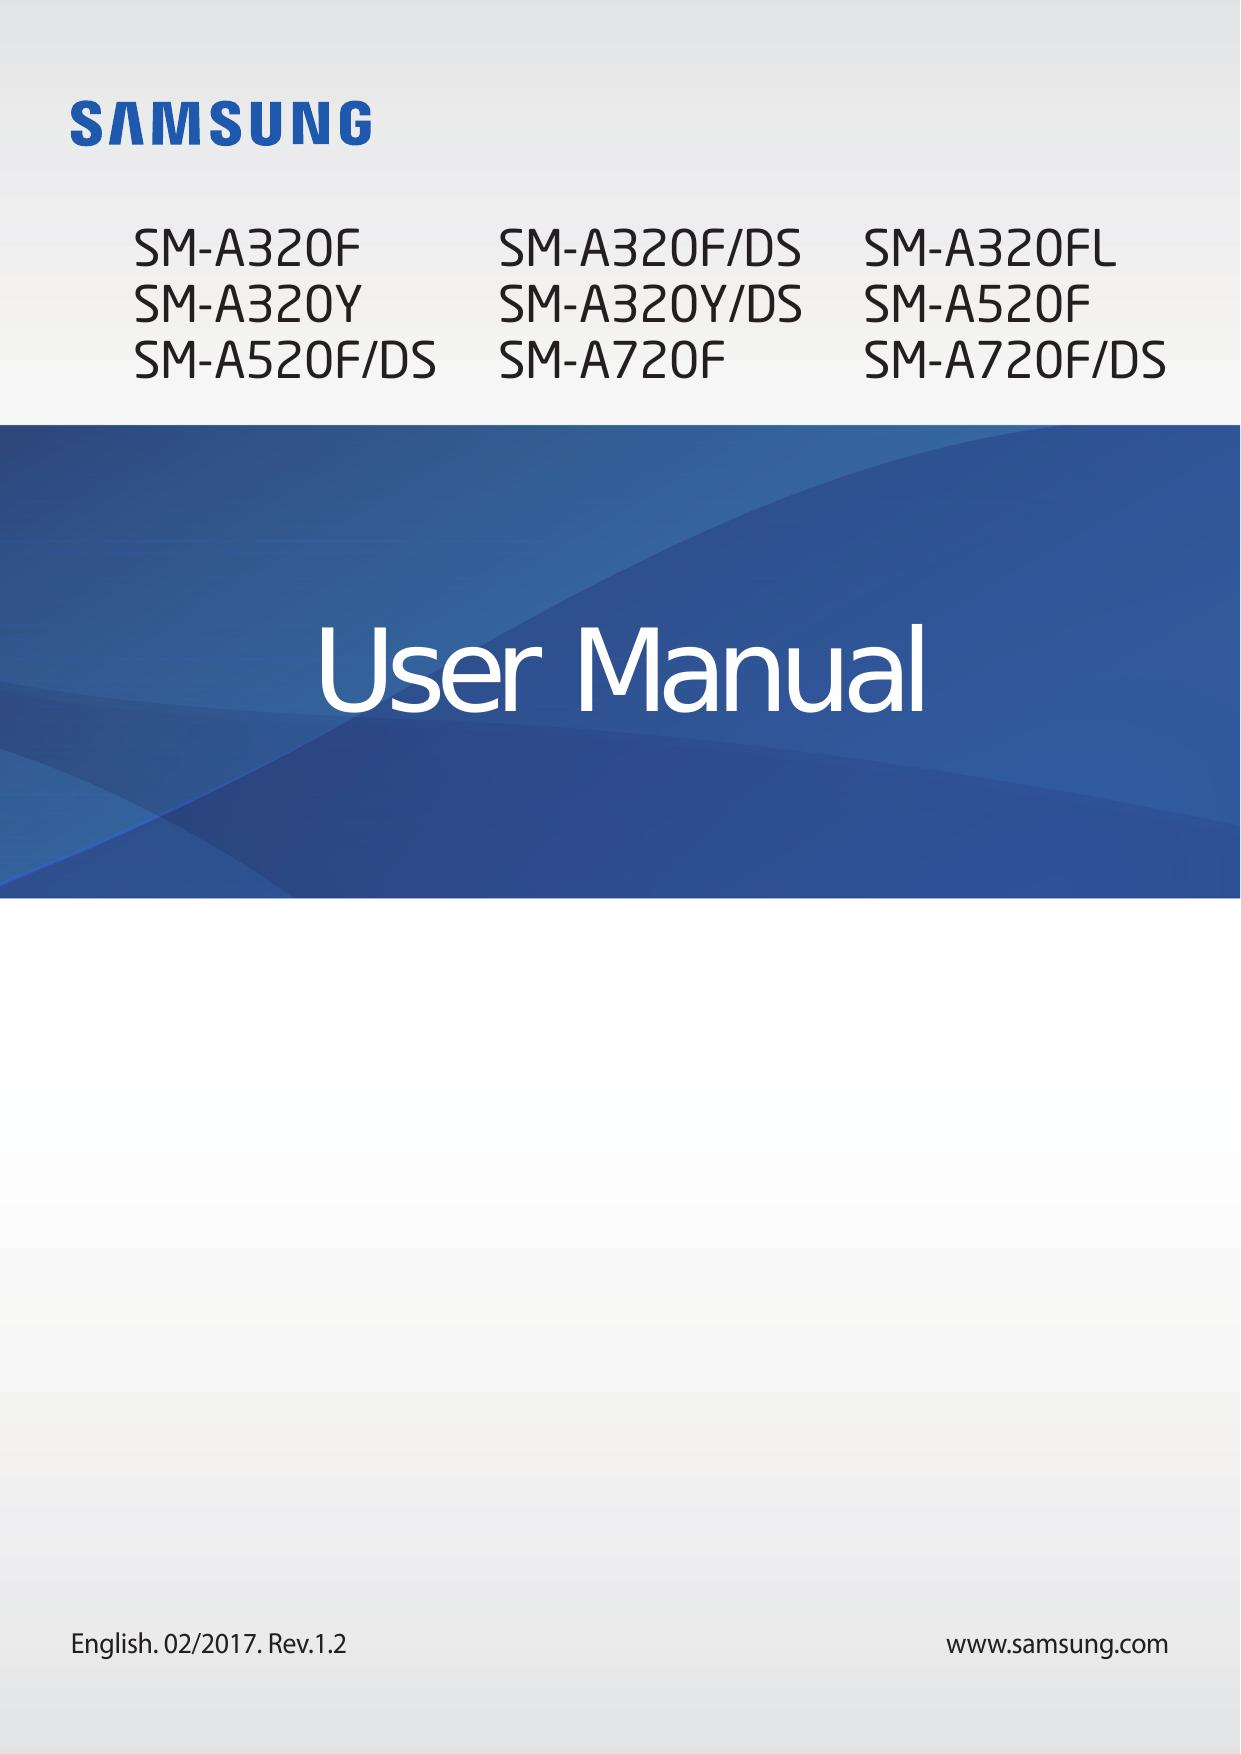 manual samsung galaxy a7 2017 android 6 0 device guides rh helpforsmartphone com manual de usuario tablet samsung galaxy 10.1 manual de usuario samsung tab a 6